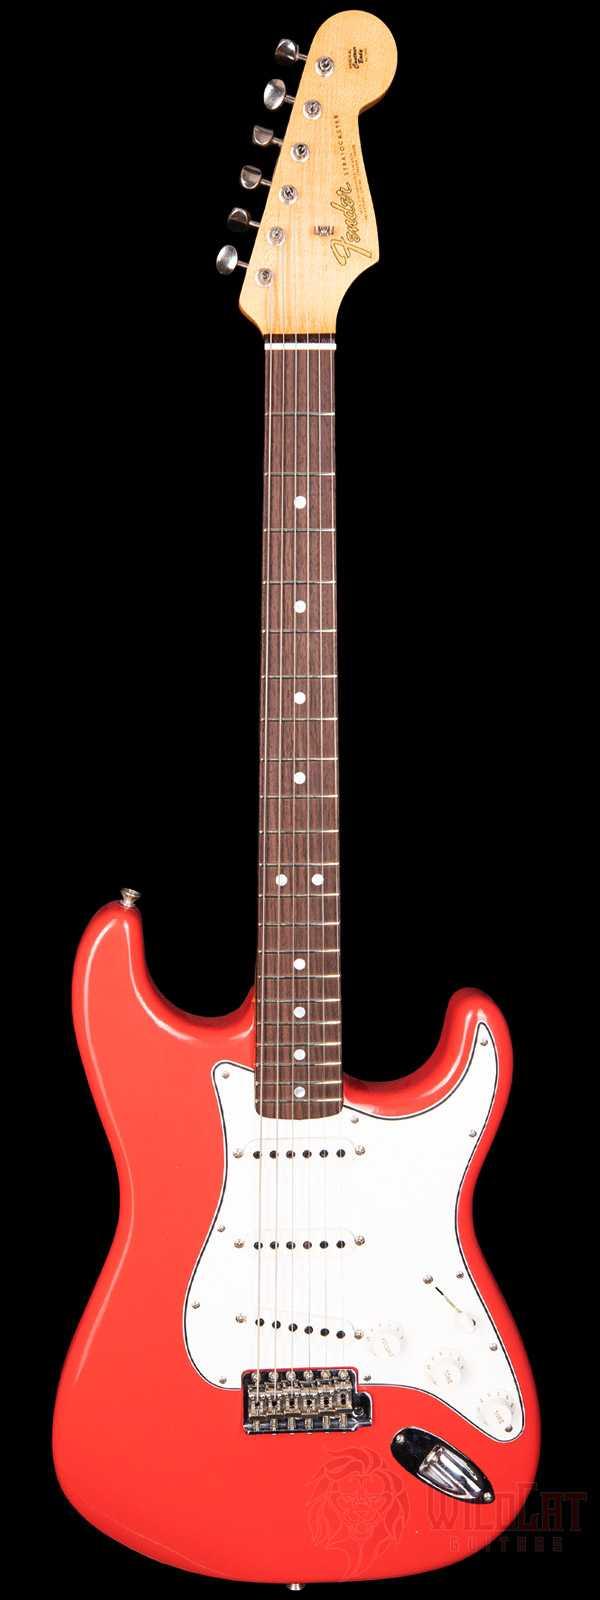 Fender Custom Shop 1965 Stratocaster Fiesta Red Journeyman Relic